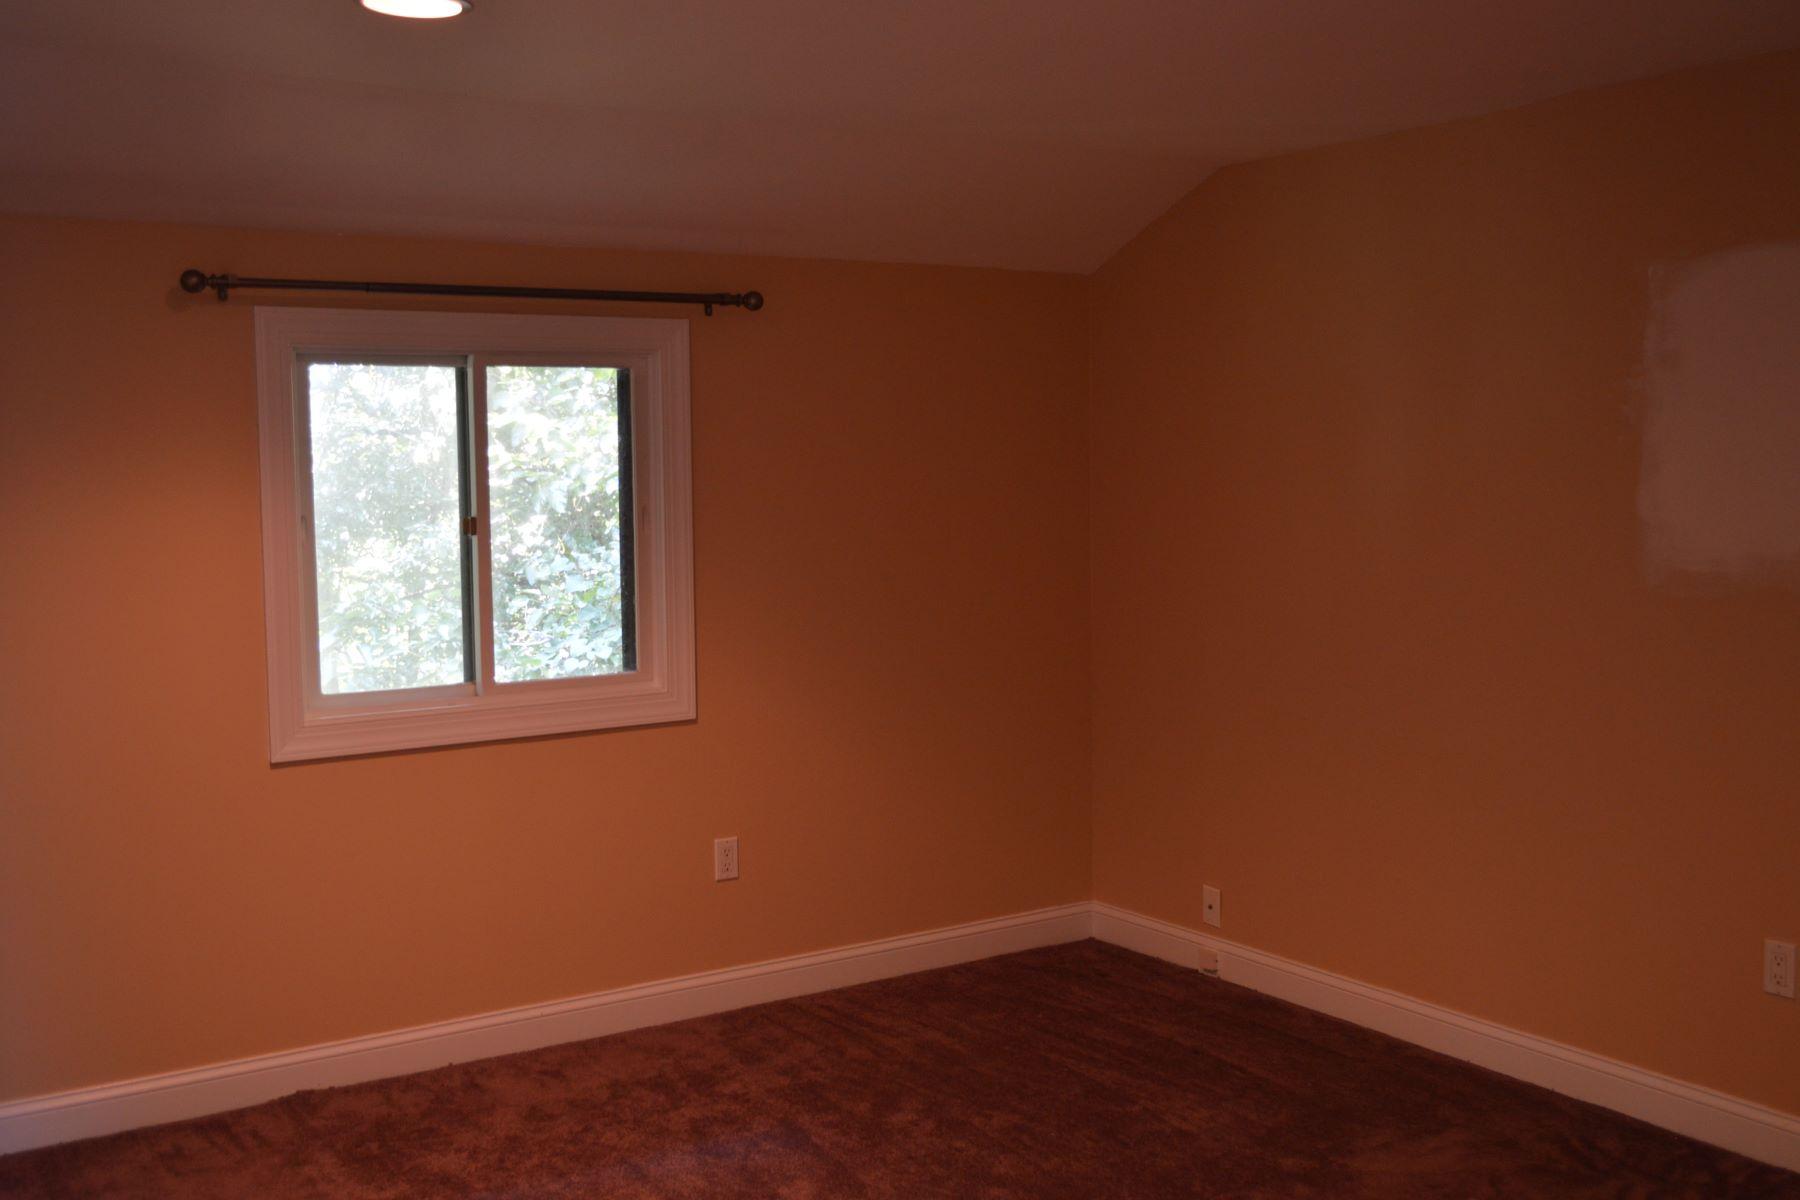 Additional photo for property listing at 988 Woodridge Blvd  Lancaster, Pennsylvania 17601 Estados Unidos